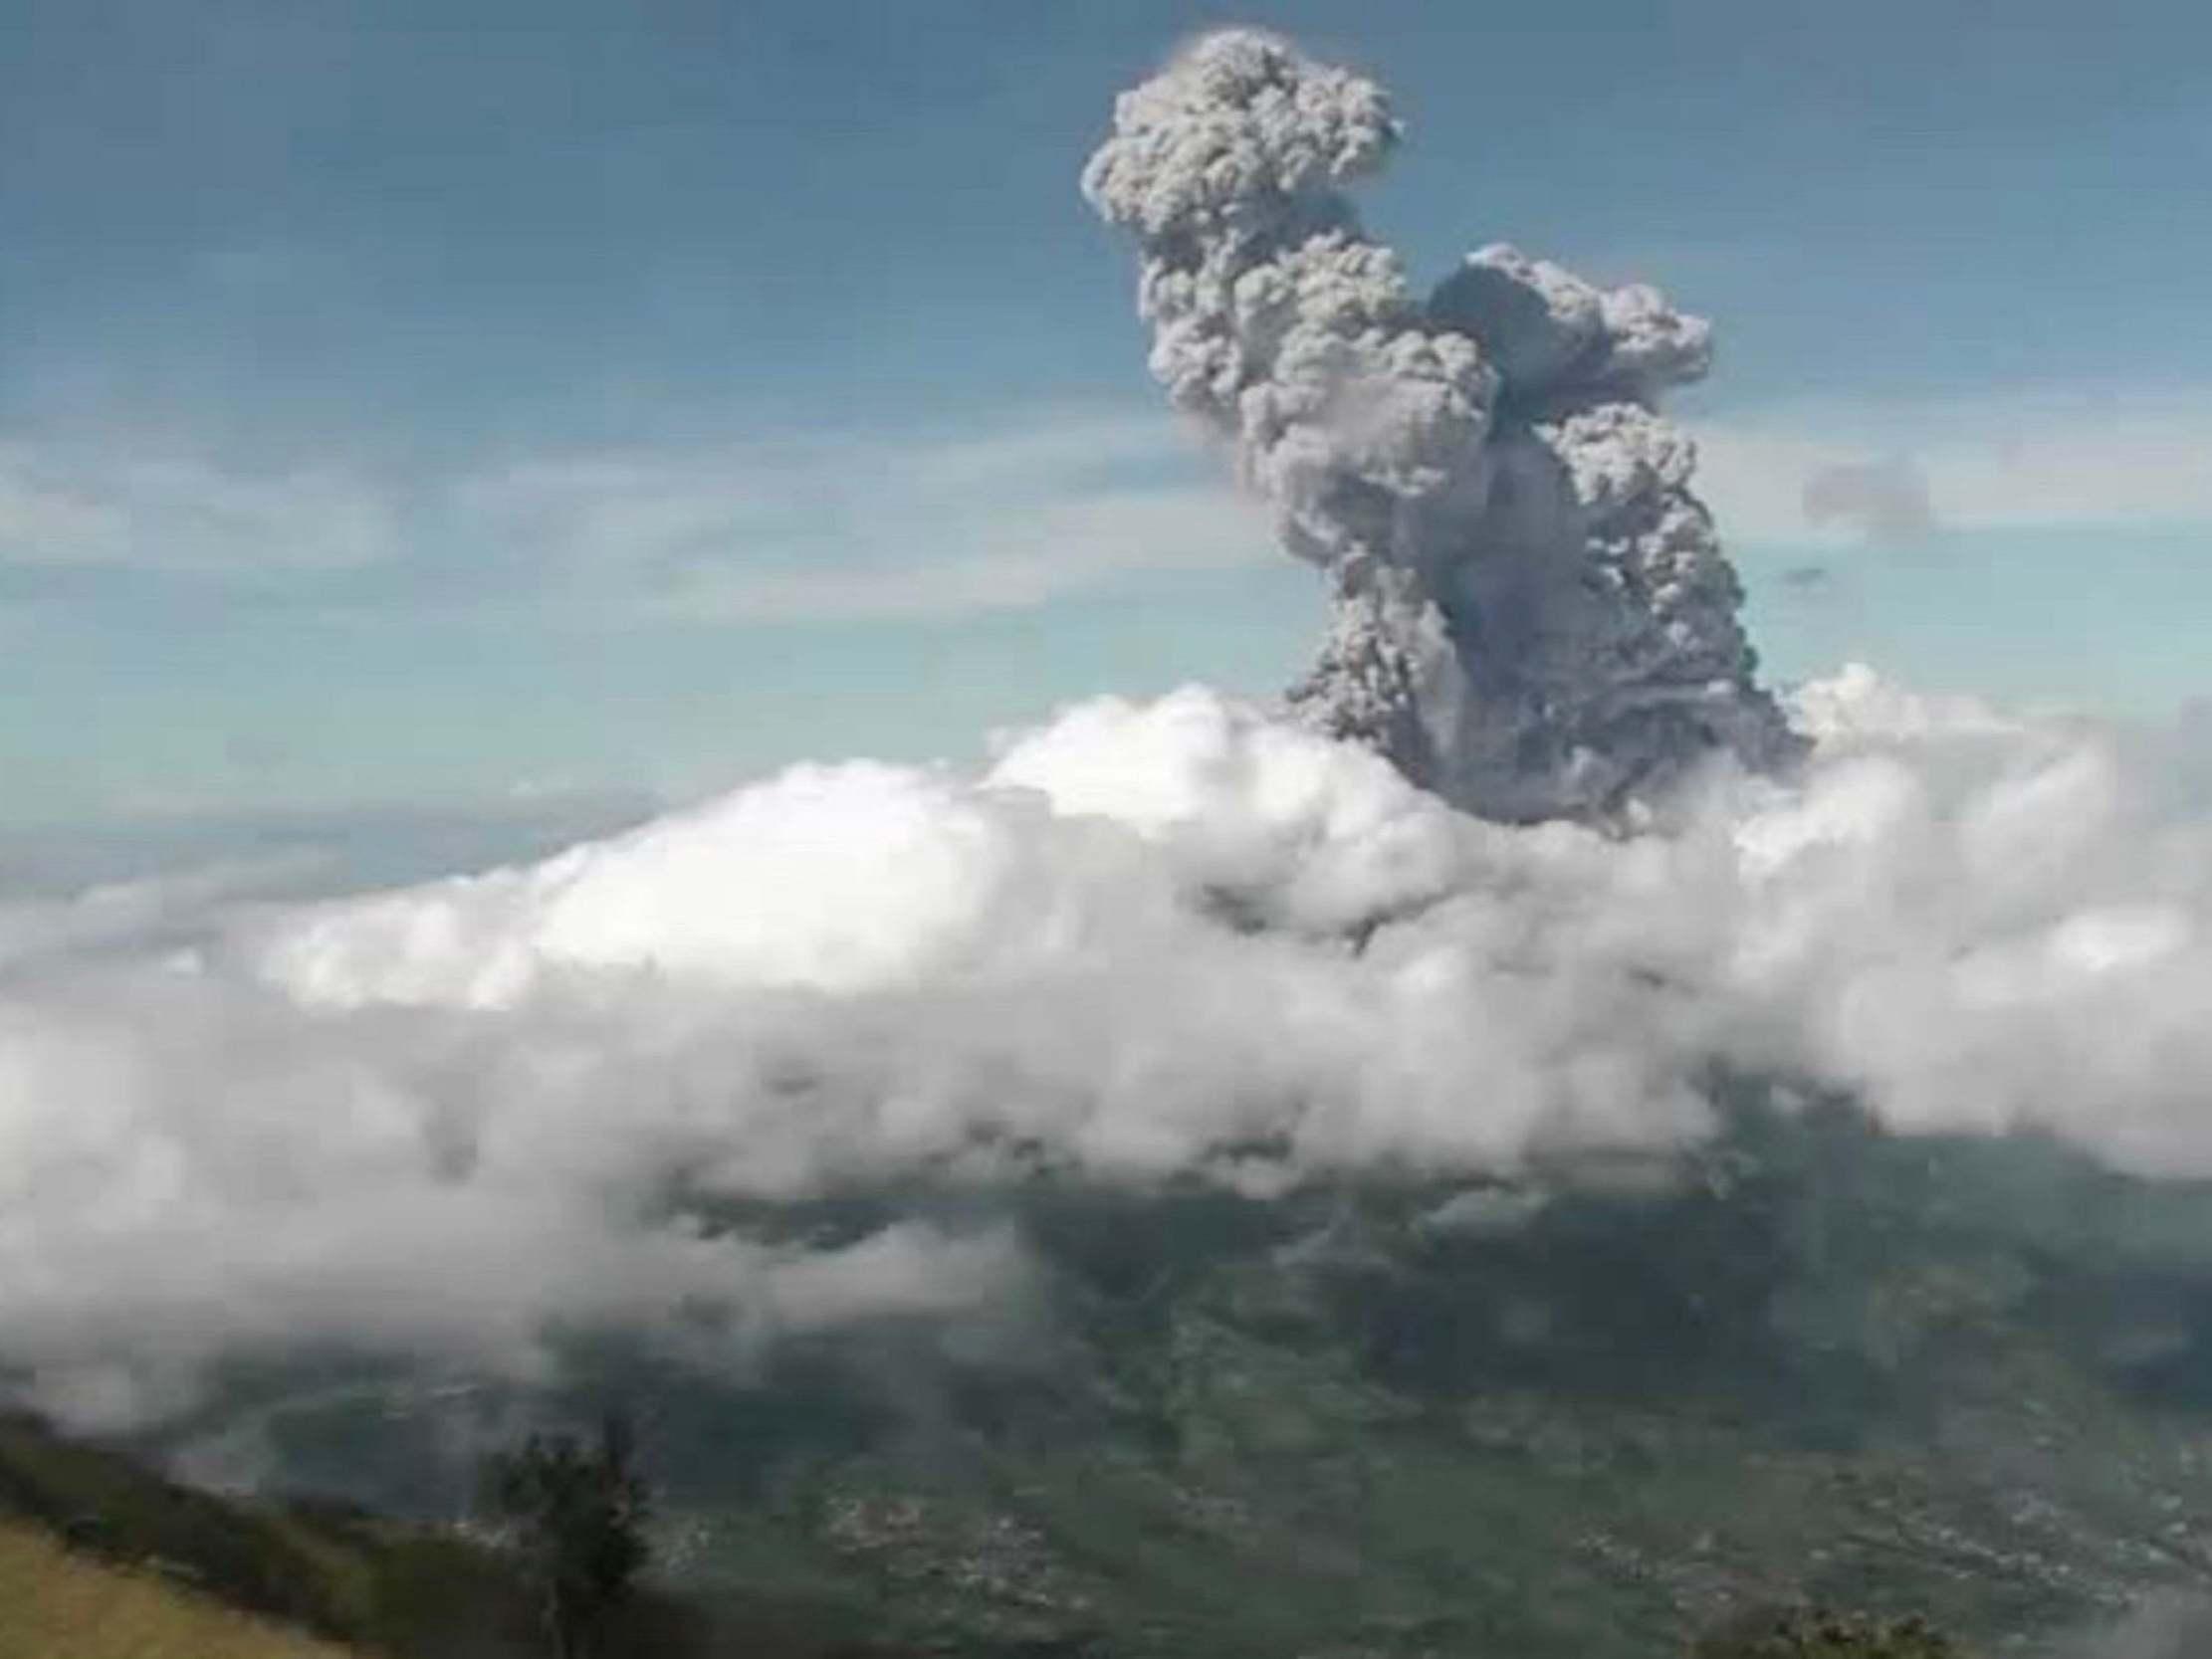 Mount Merapi: Indonesia's most volatile volcano spews 6km-high column of ash in new eruption